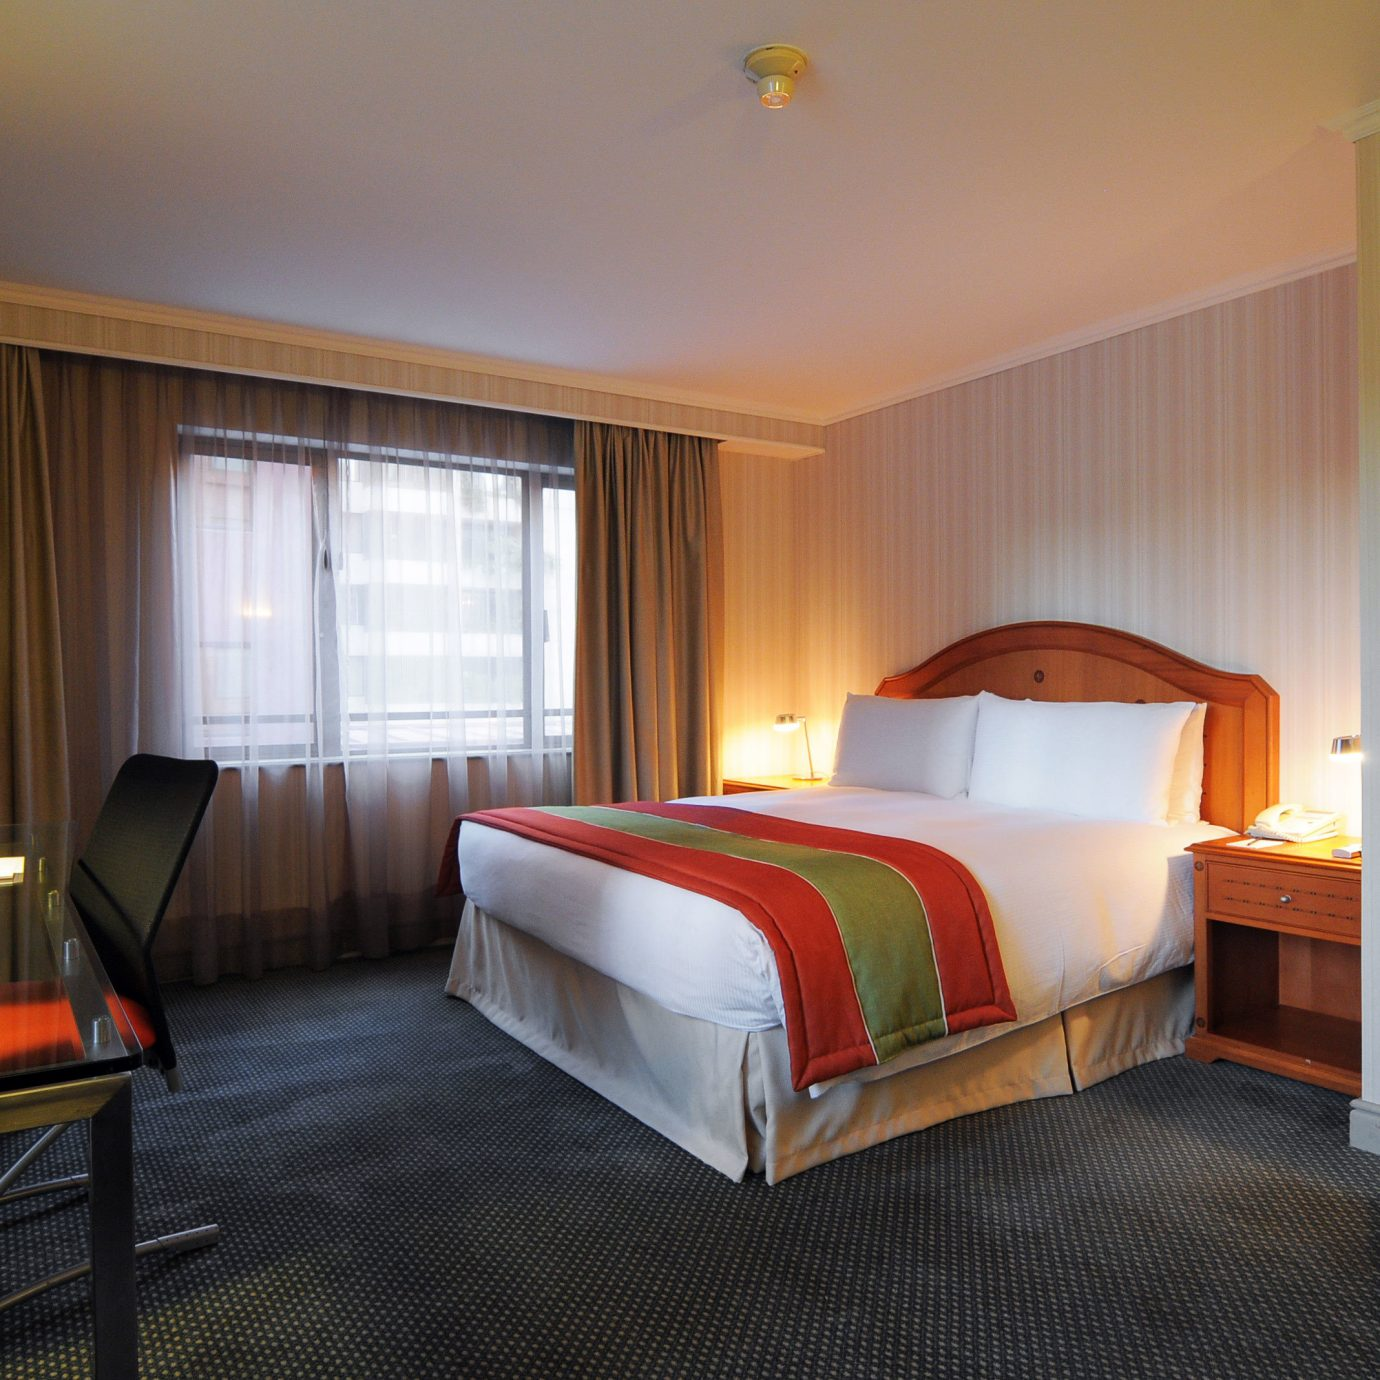 Bedroom Resort property Suite cottage lamp flat